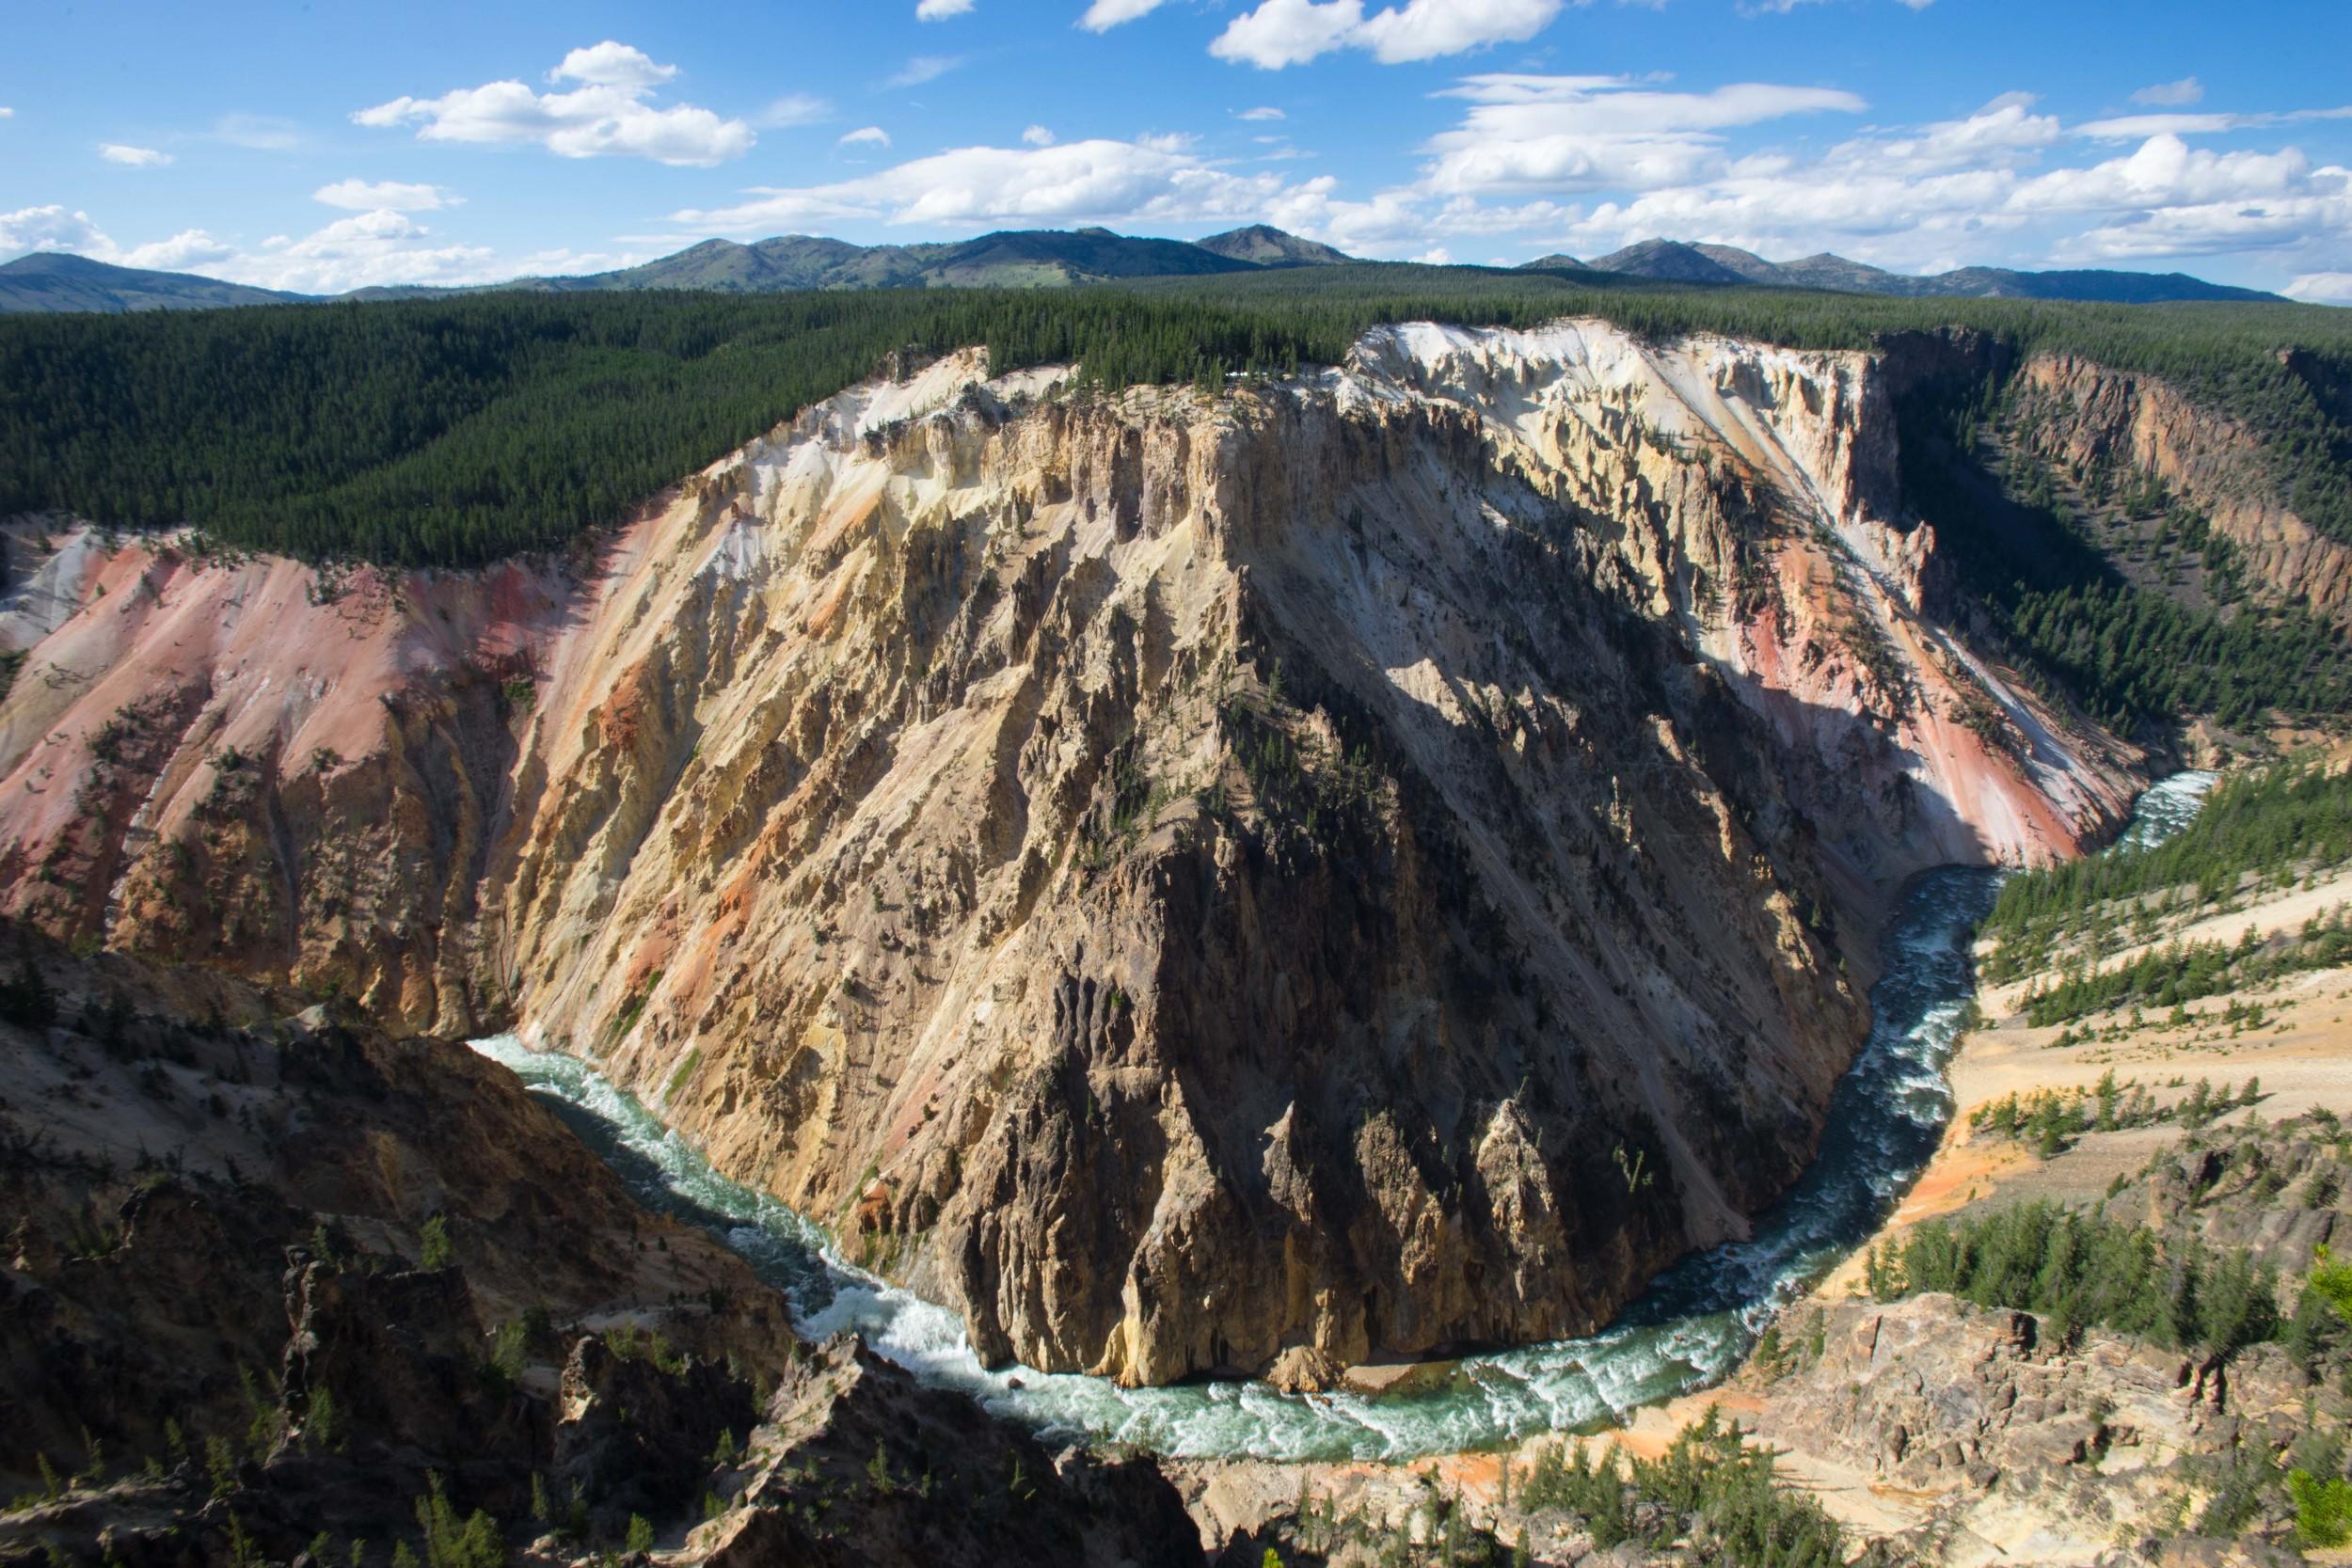 Yellowstone-Jul14-2015_31.jpg